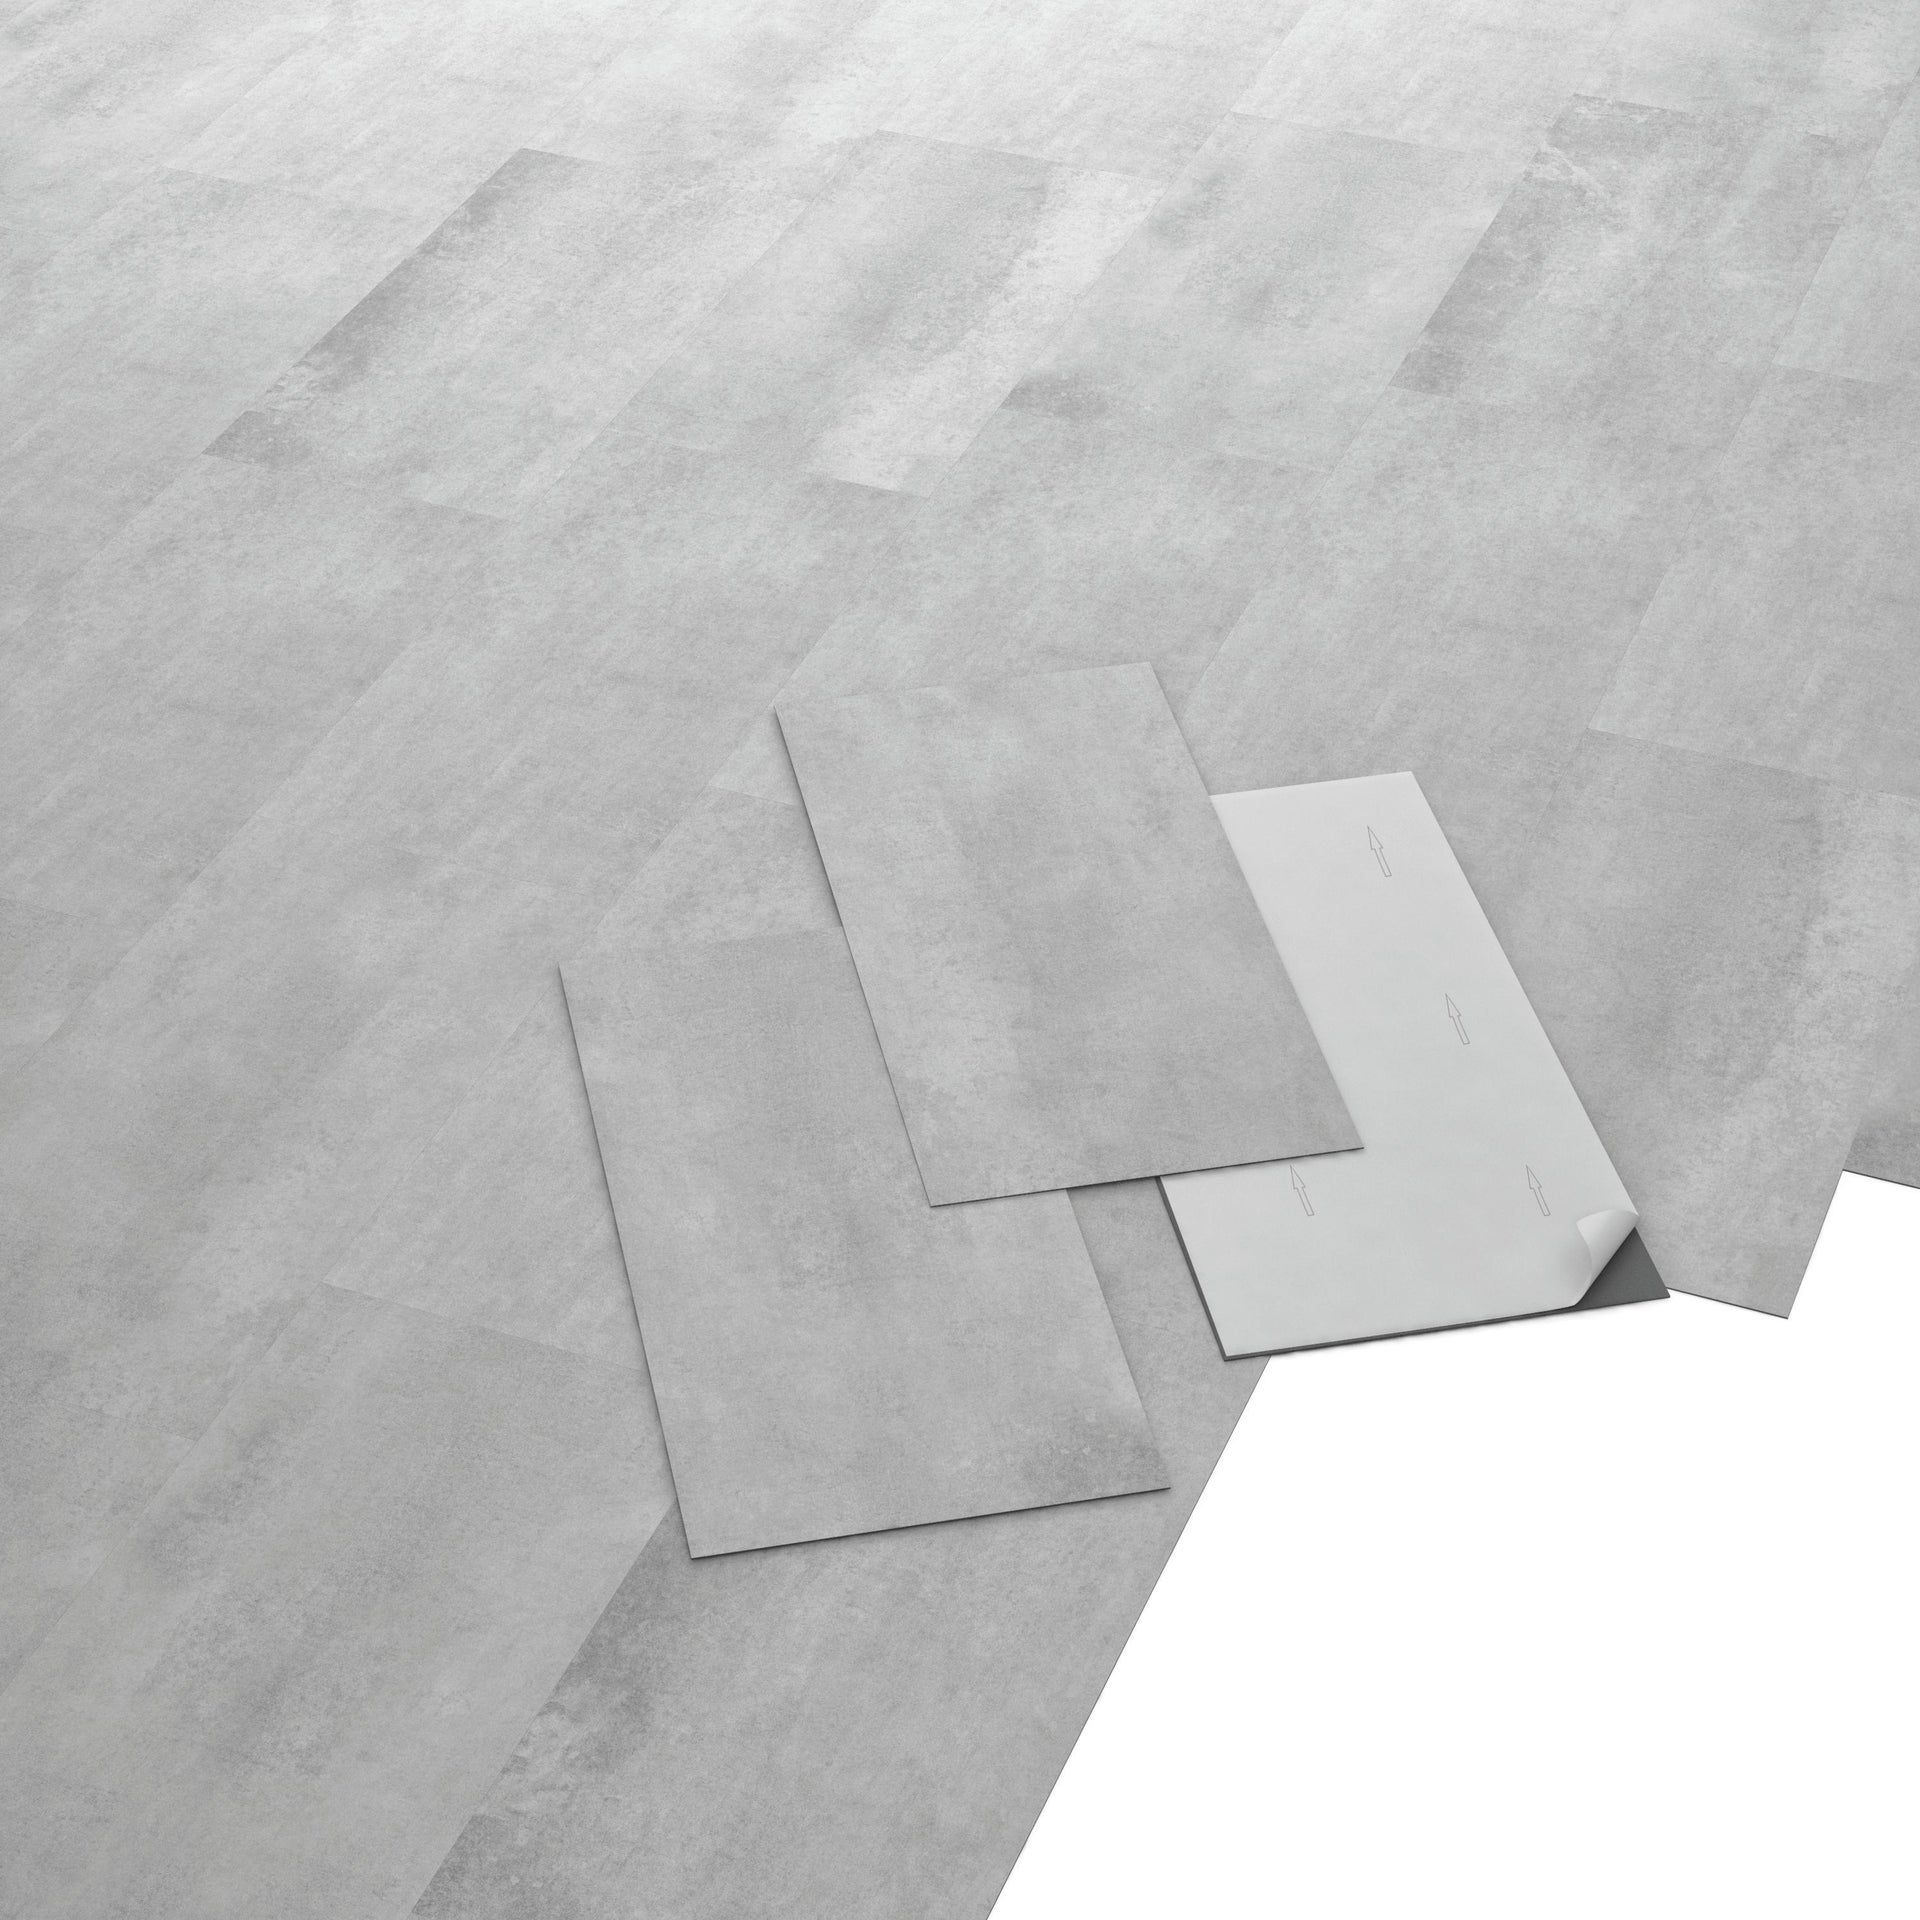 Pavimento PVC adesivo Concrete Sp 1.5 mm grigio / argento - 3